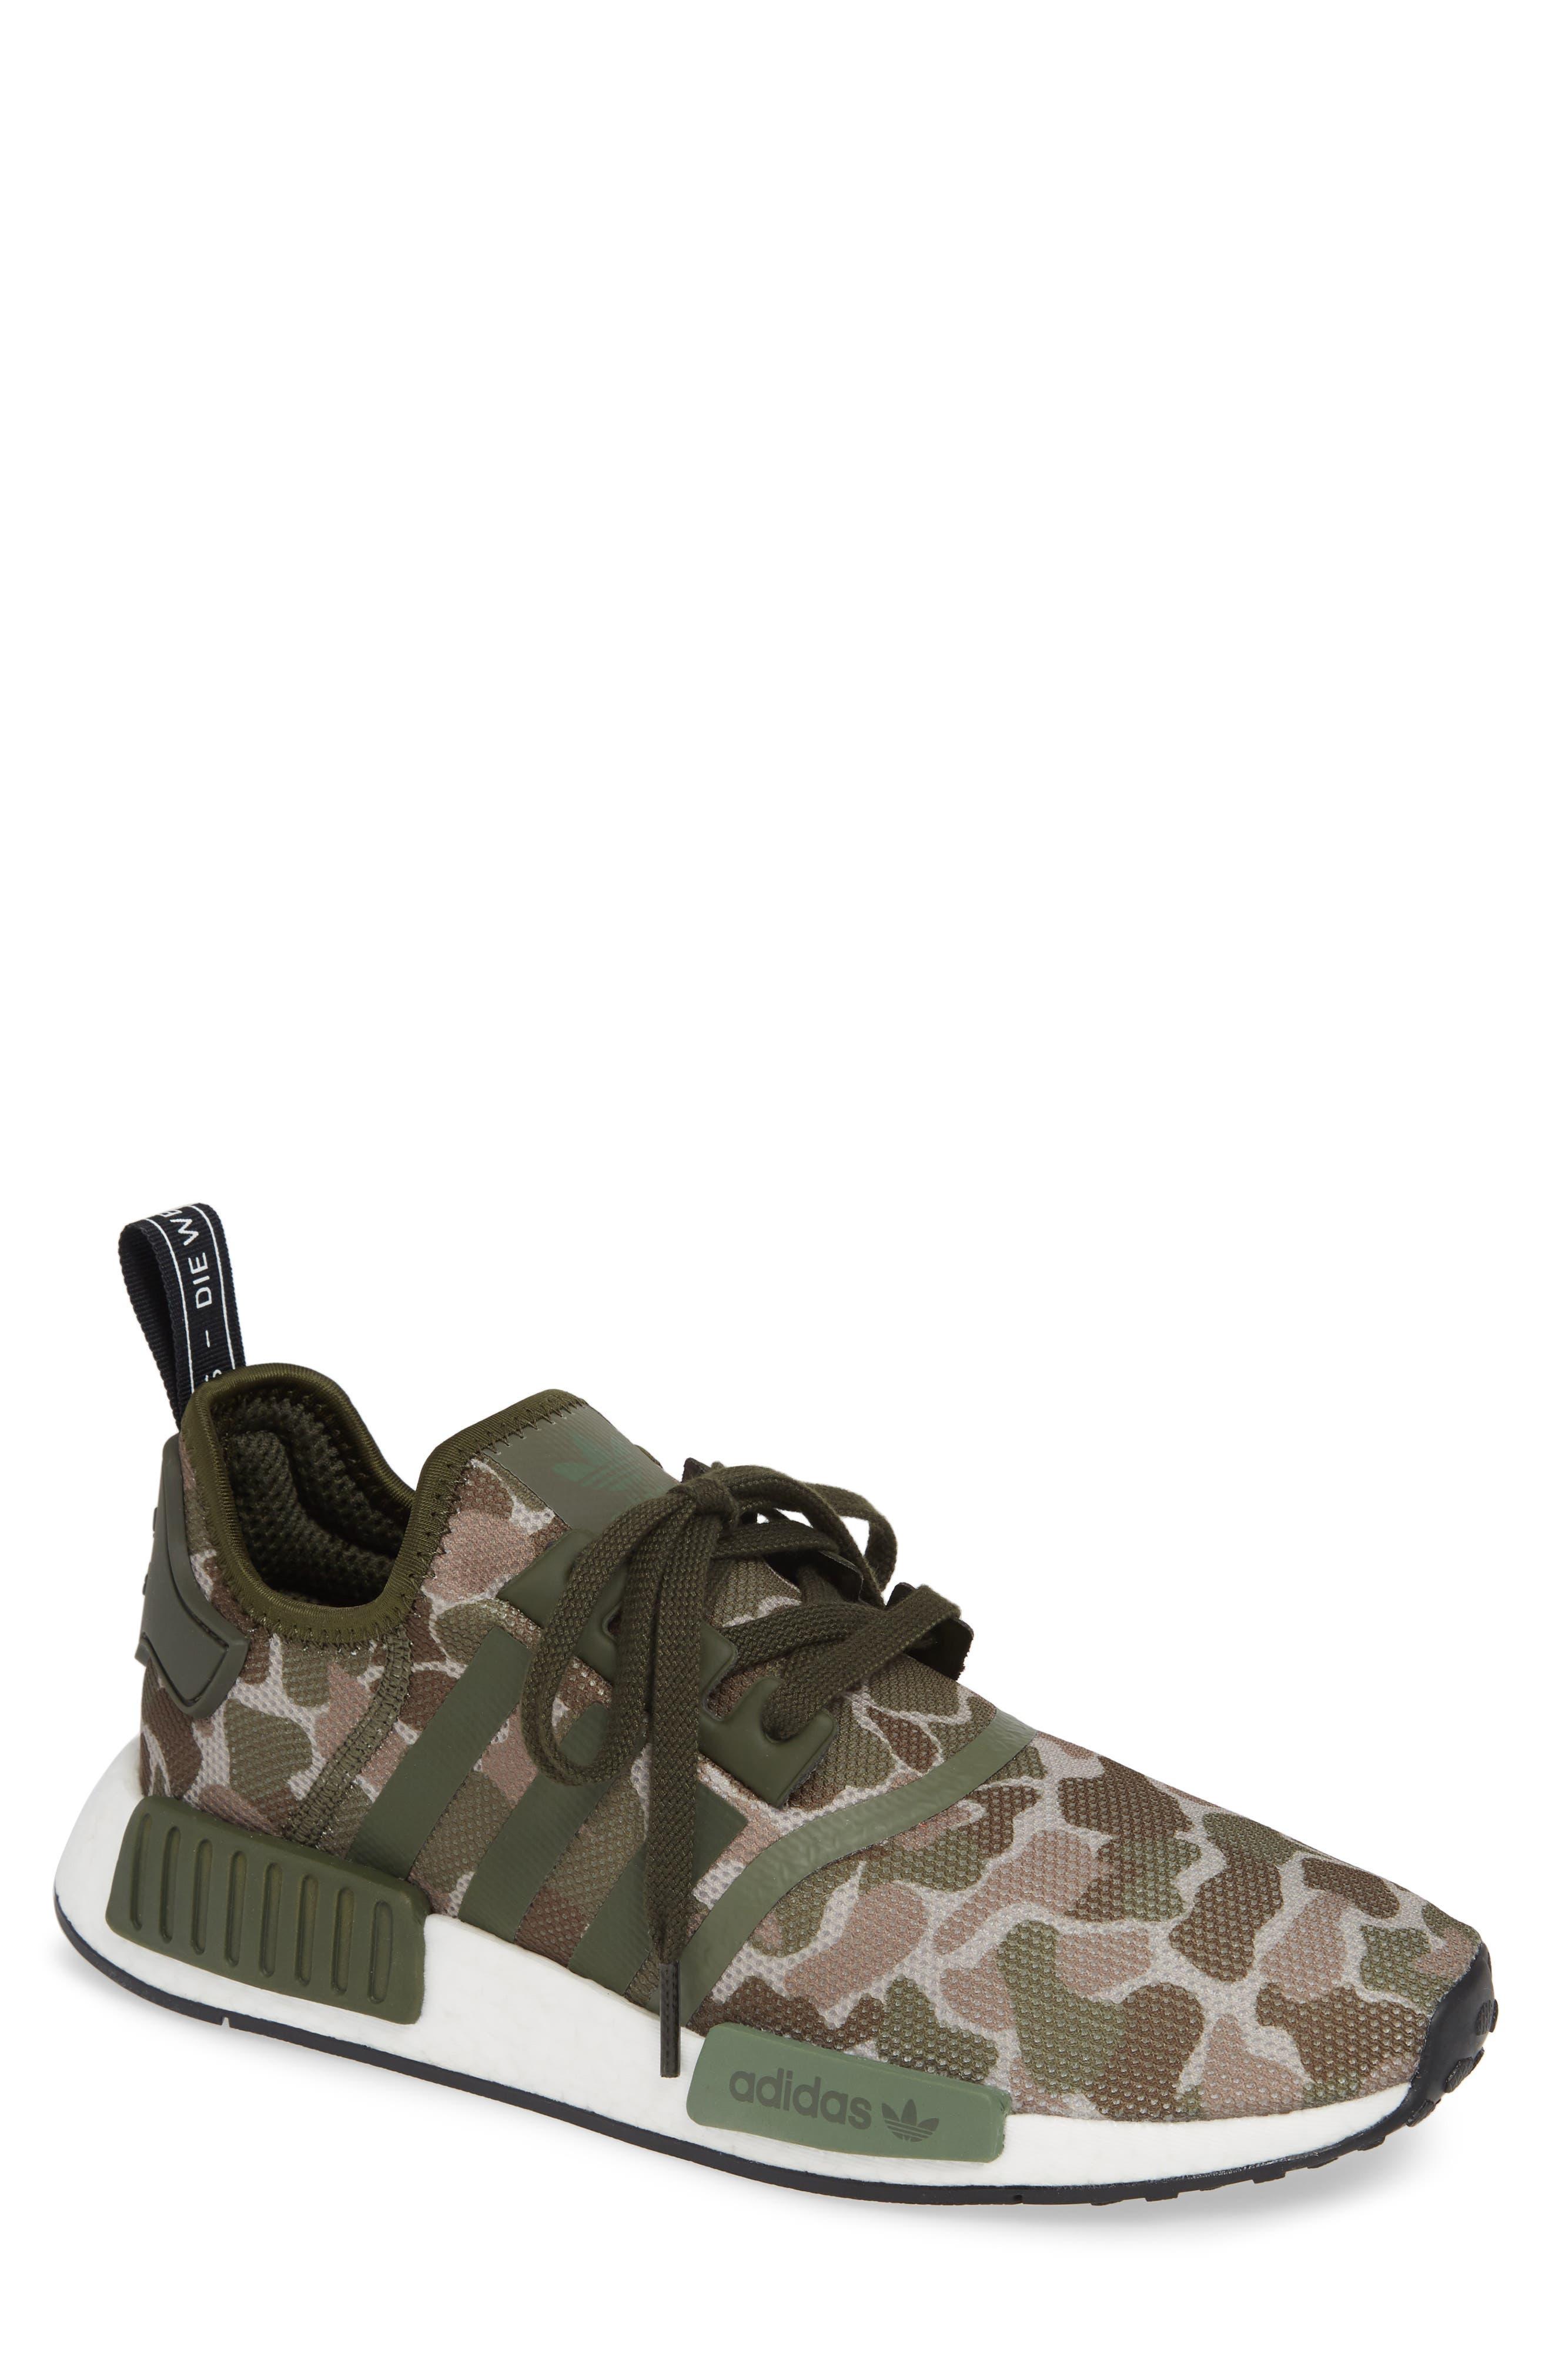 NMD R1 Camo Sneaker,                         Main,                         color, 305